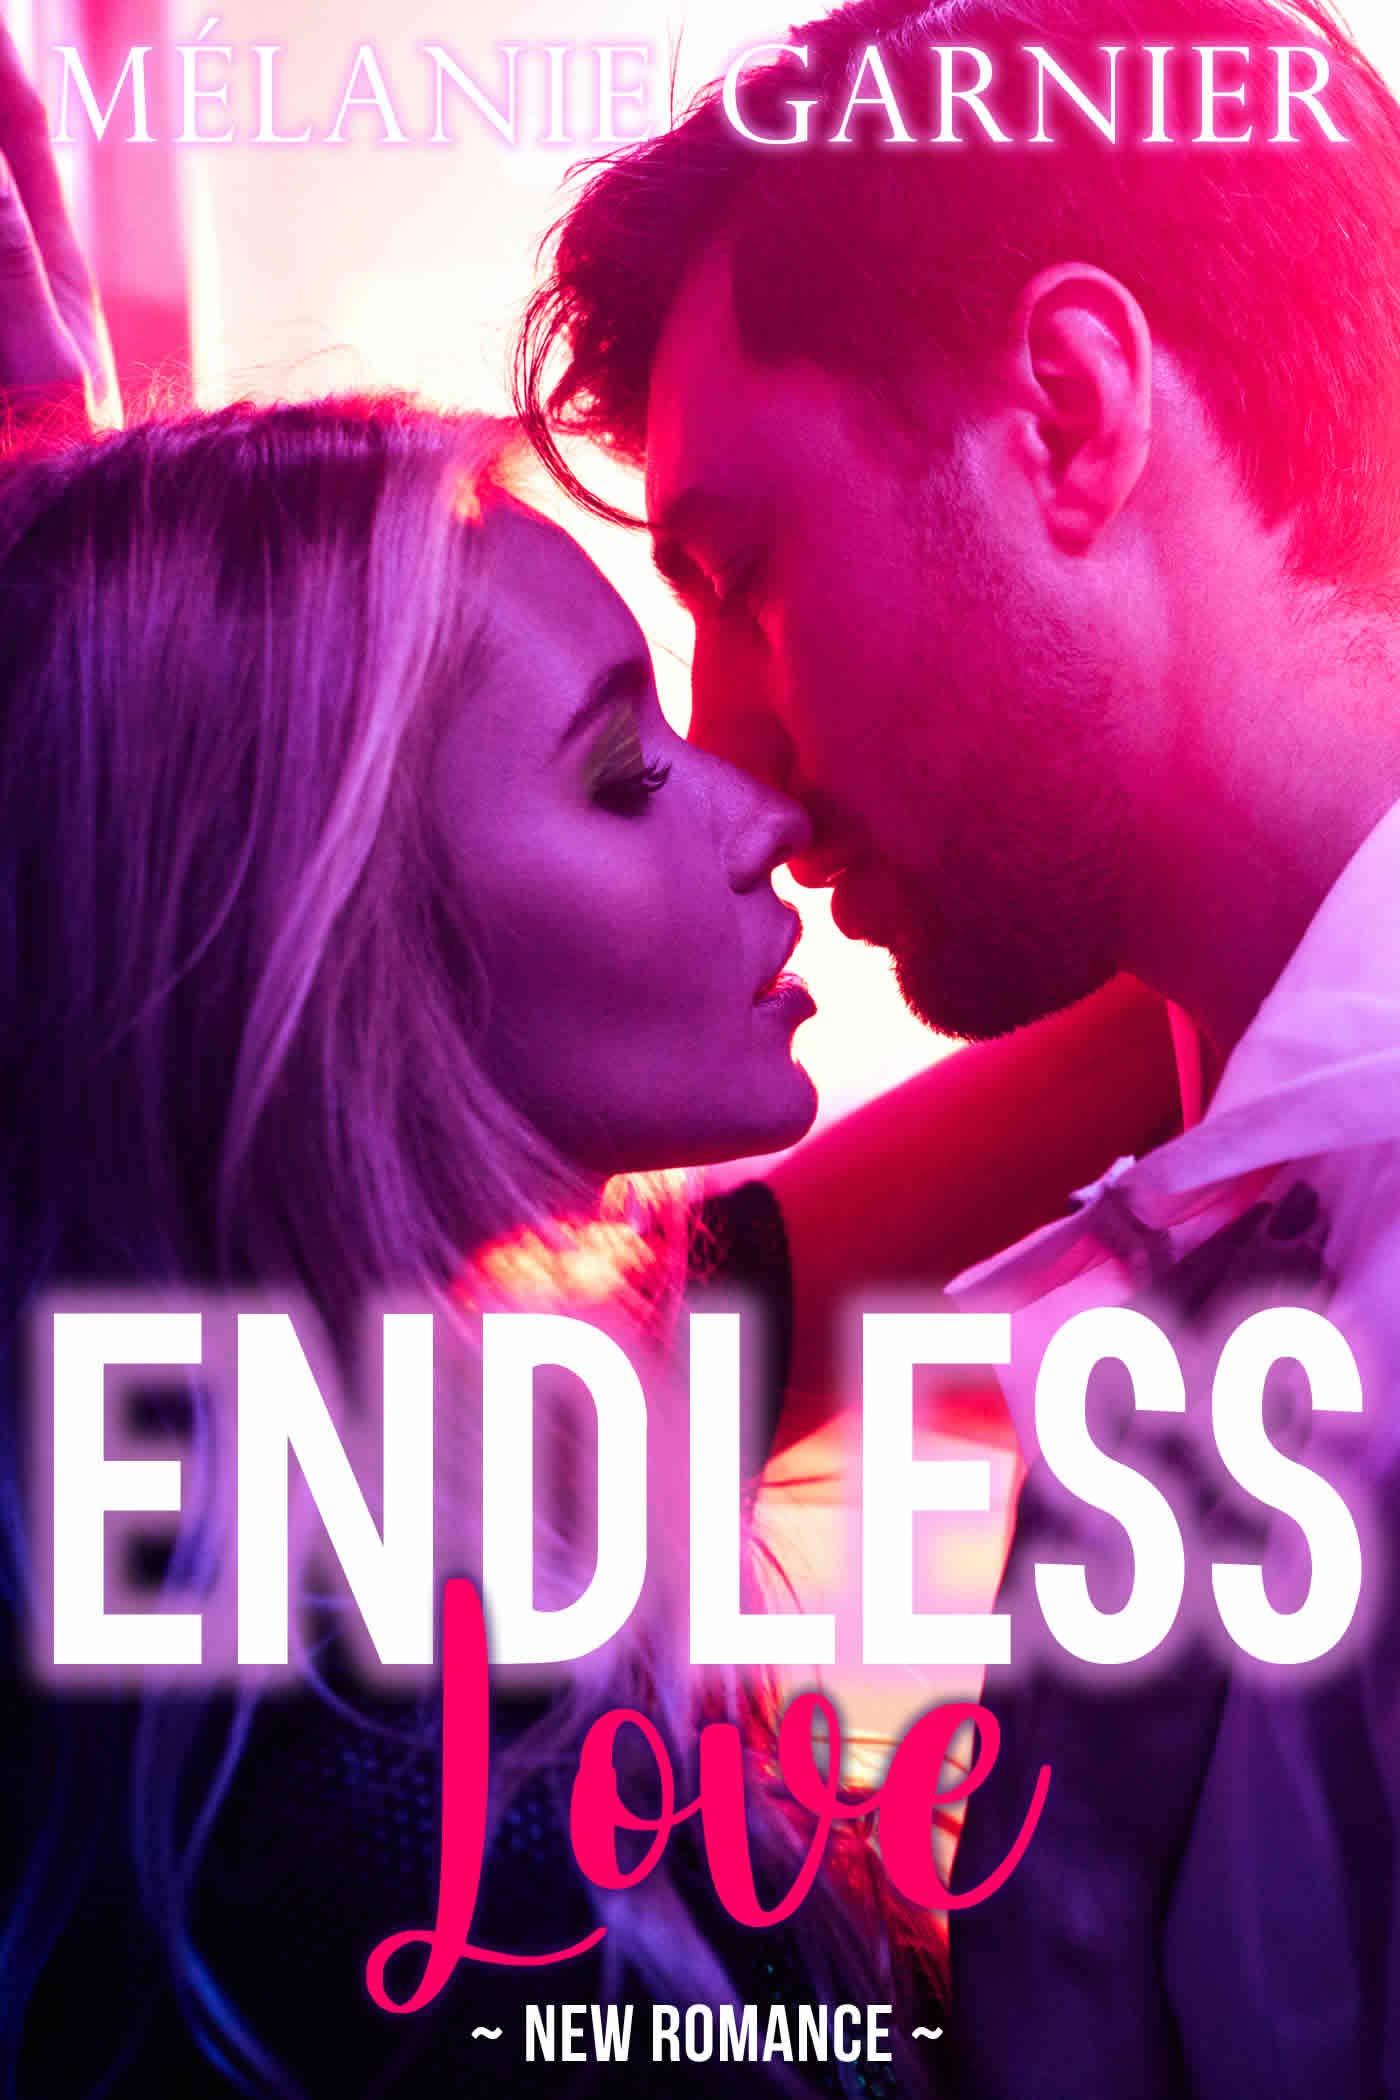 ENDLESS Love // New Romance